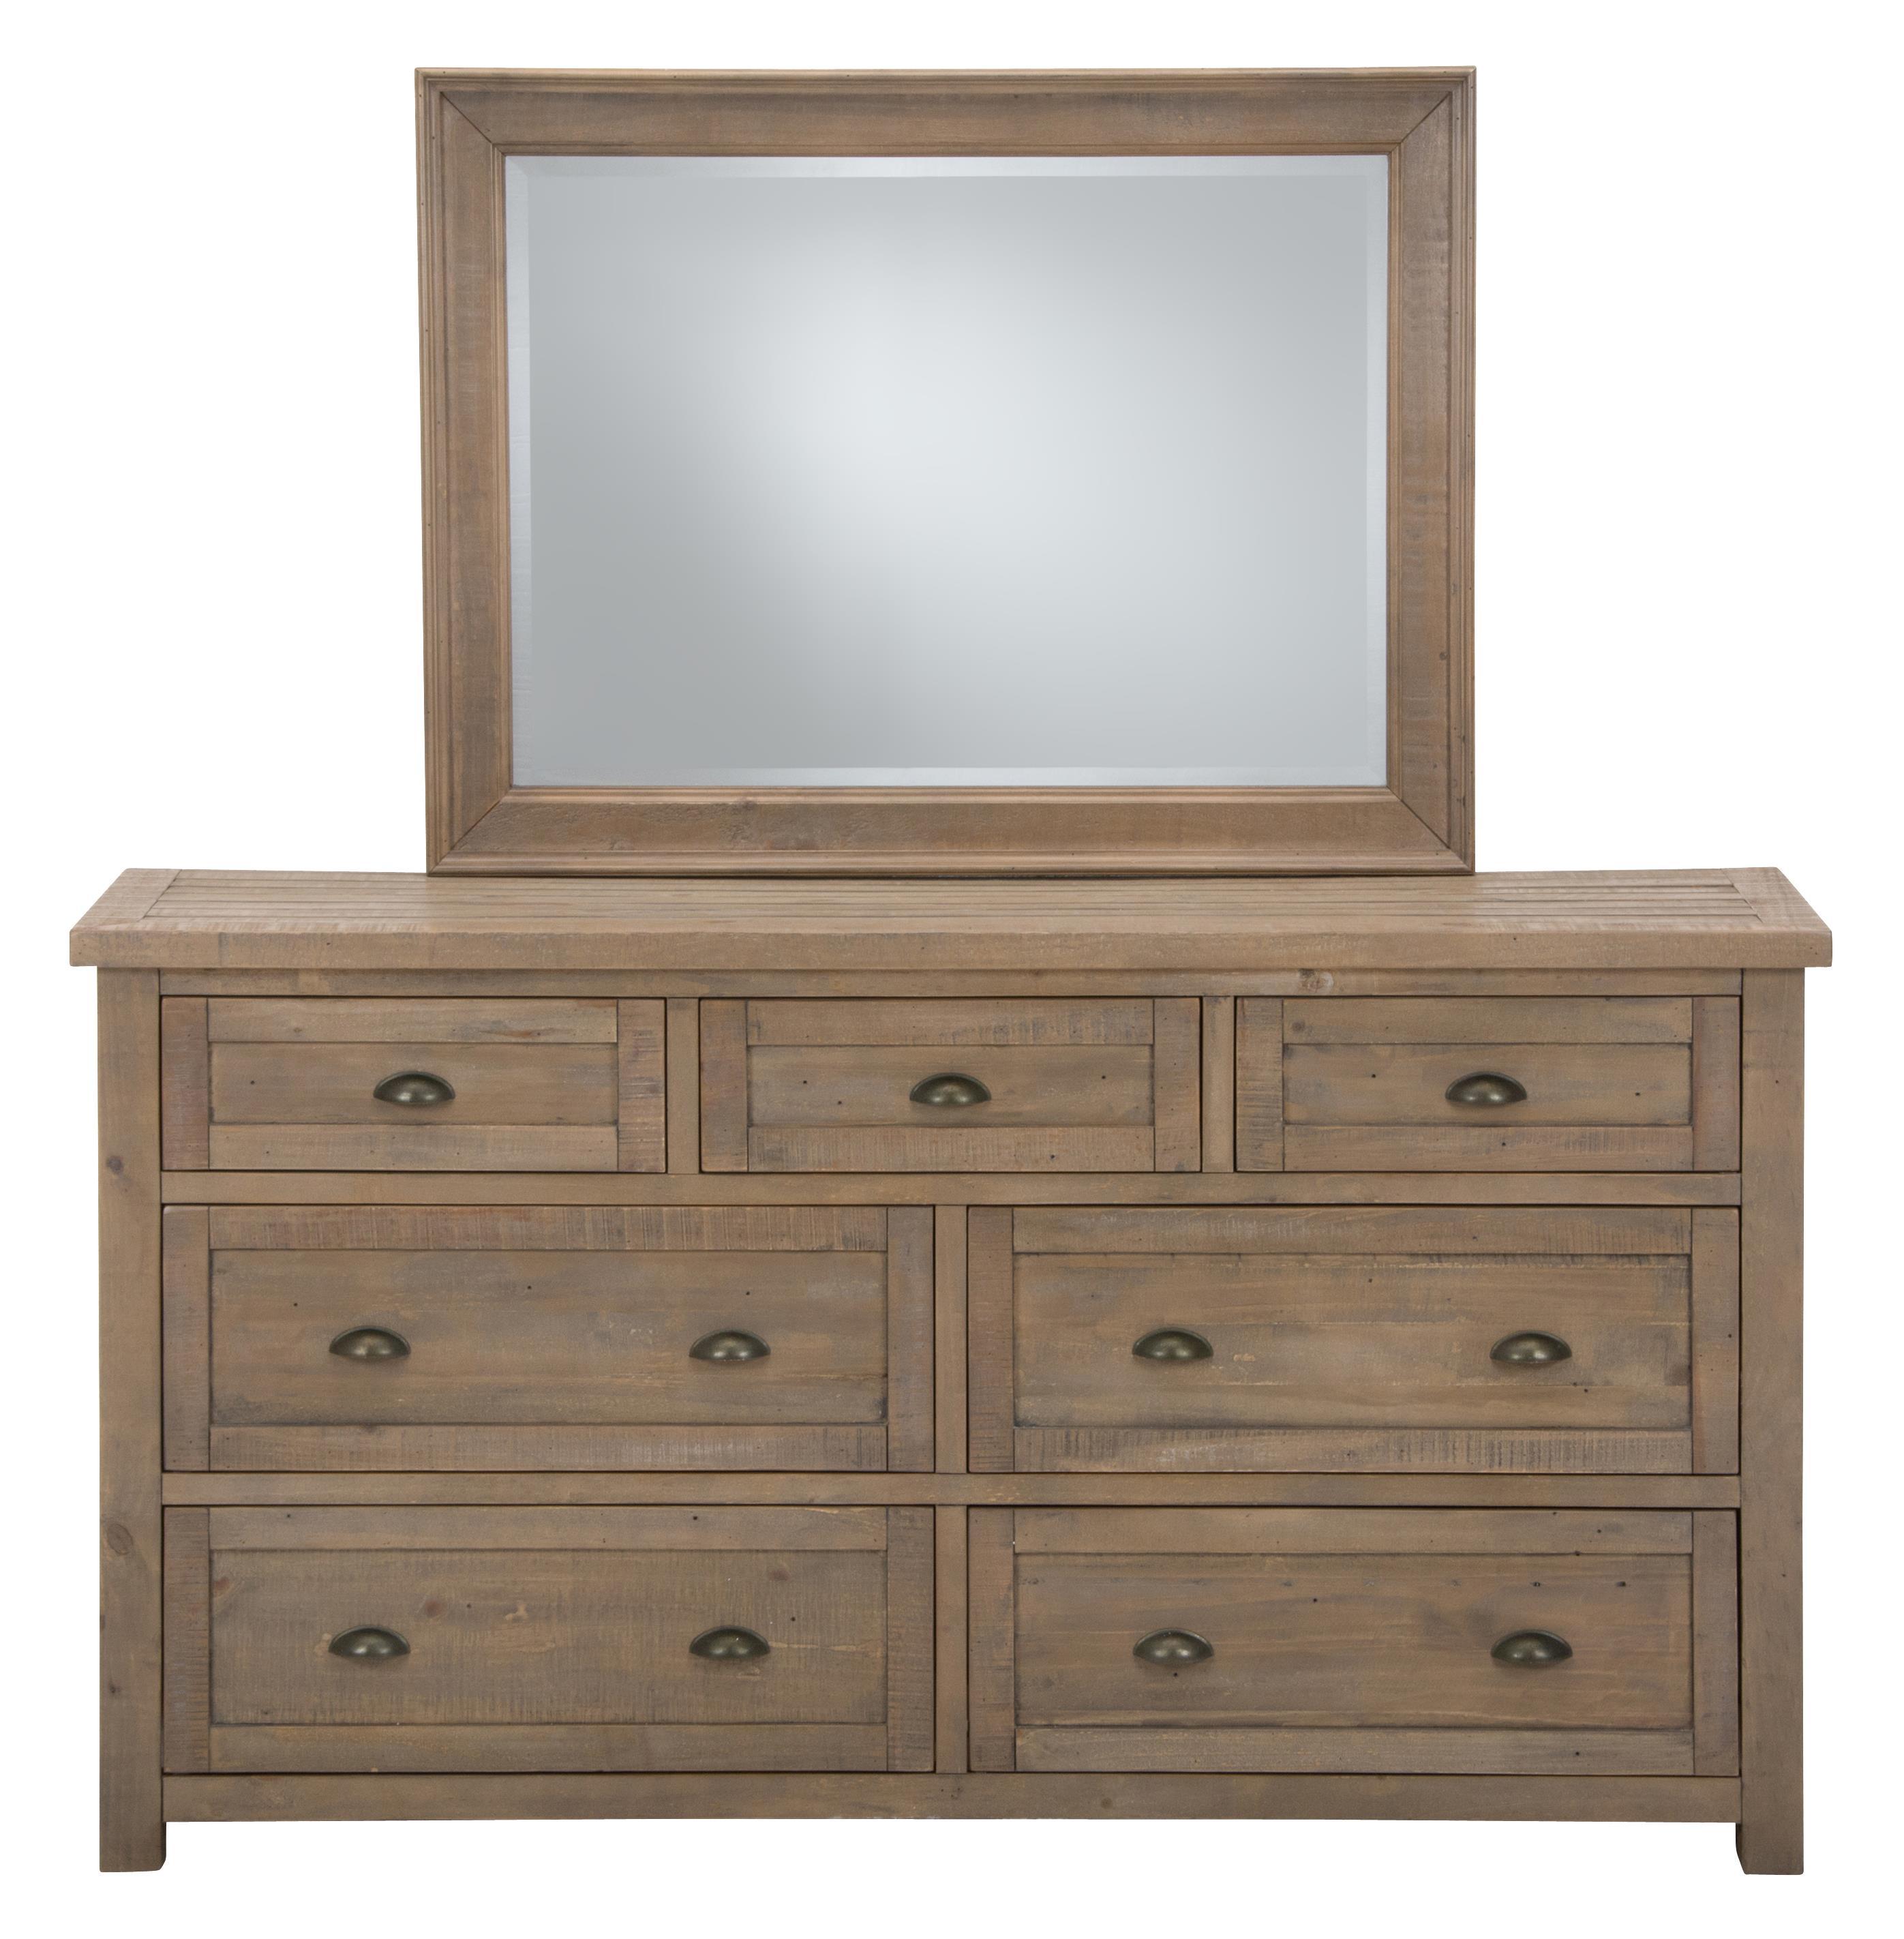 Jofran Slater Mill Pine Dresser and Mirror Set - Item Number: 943-10+20